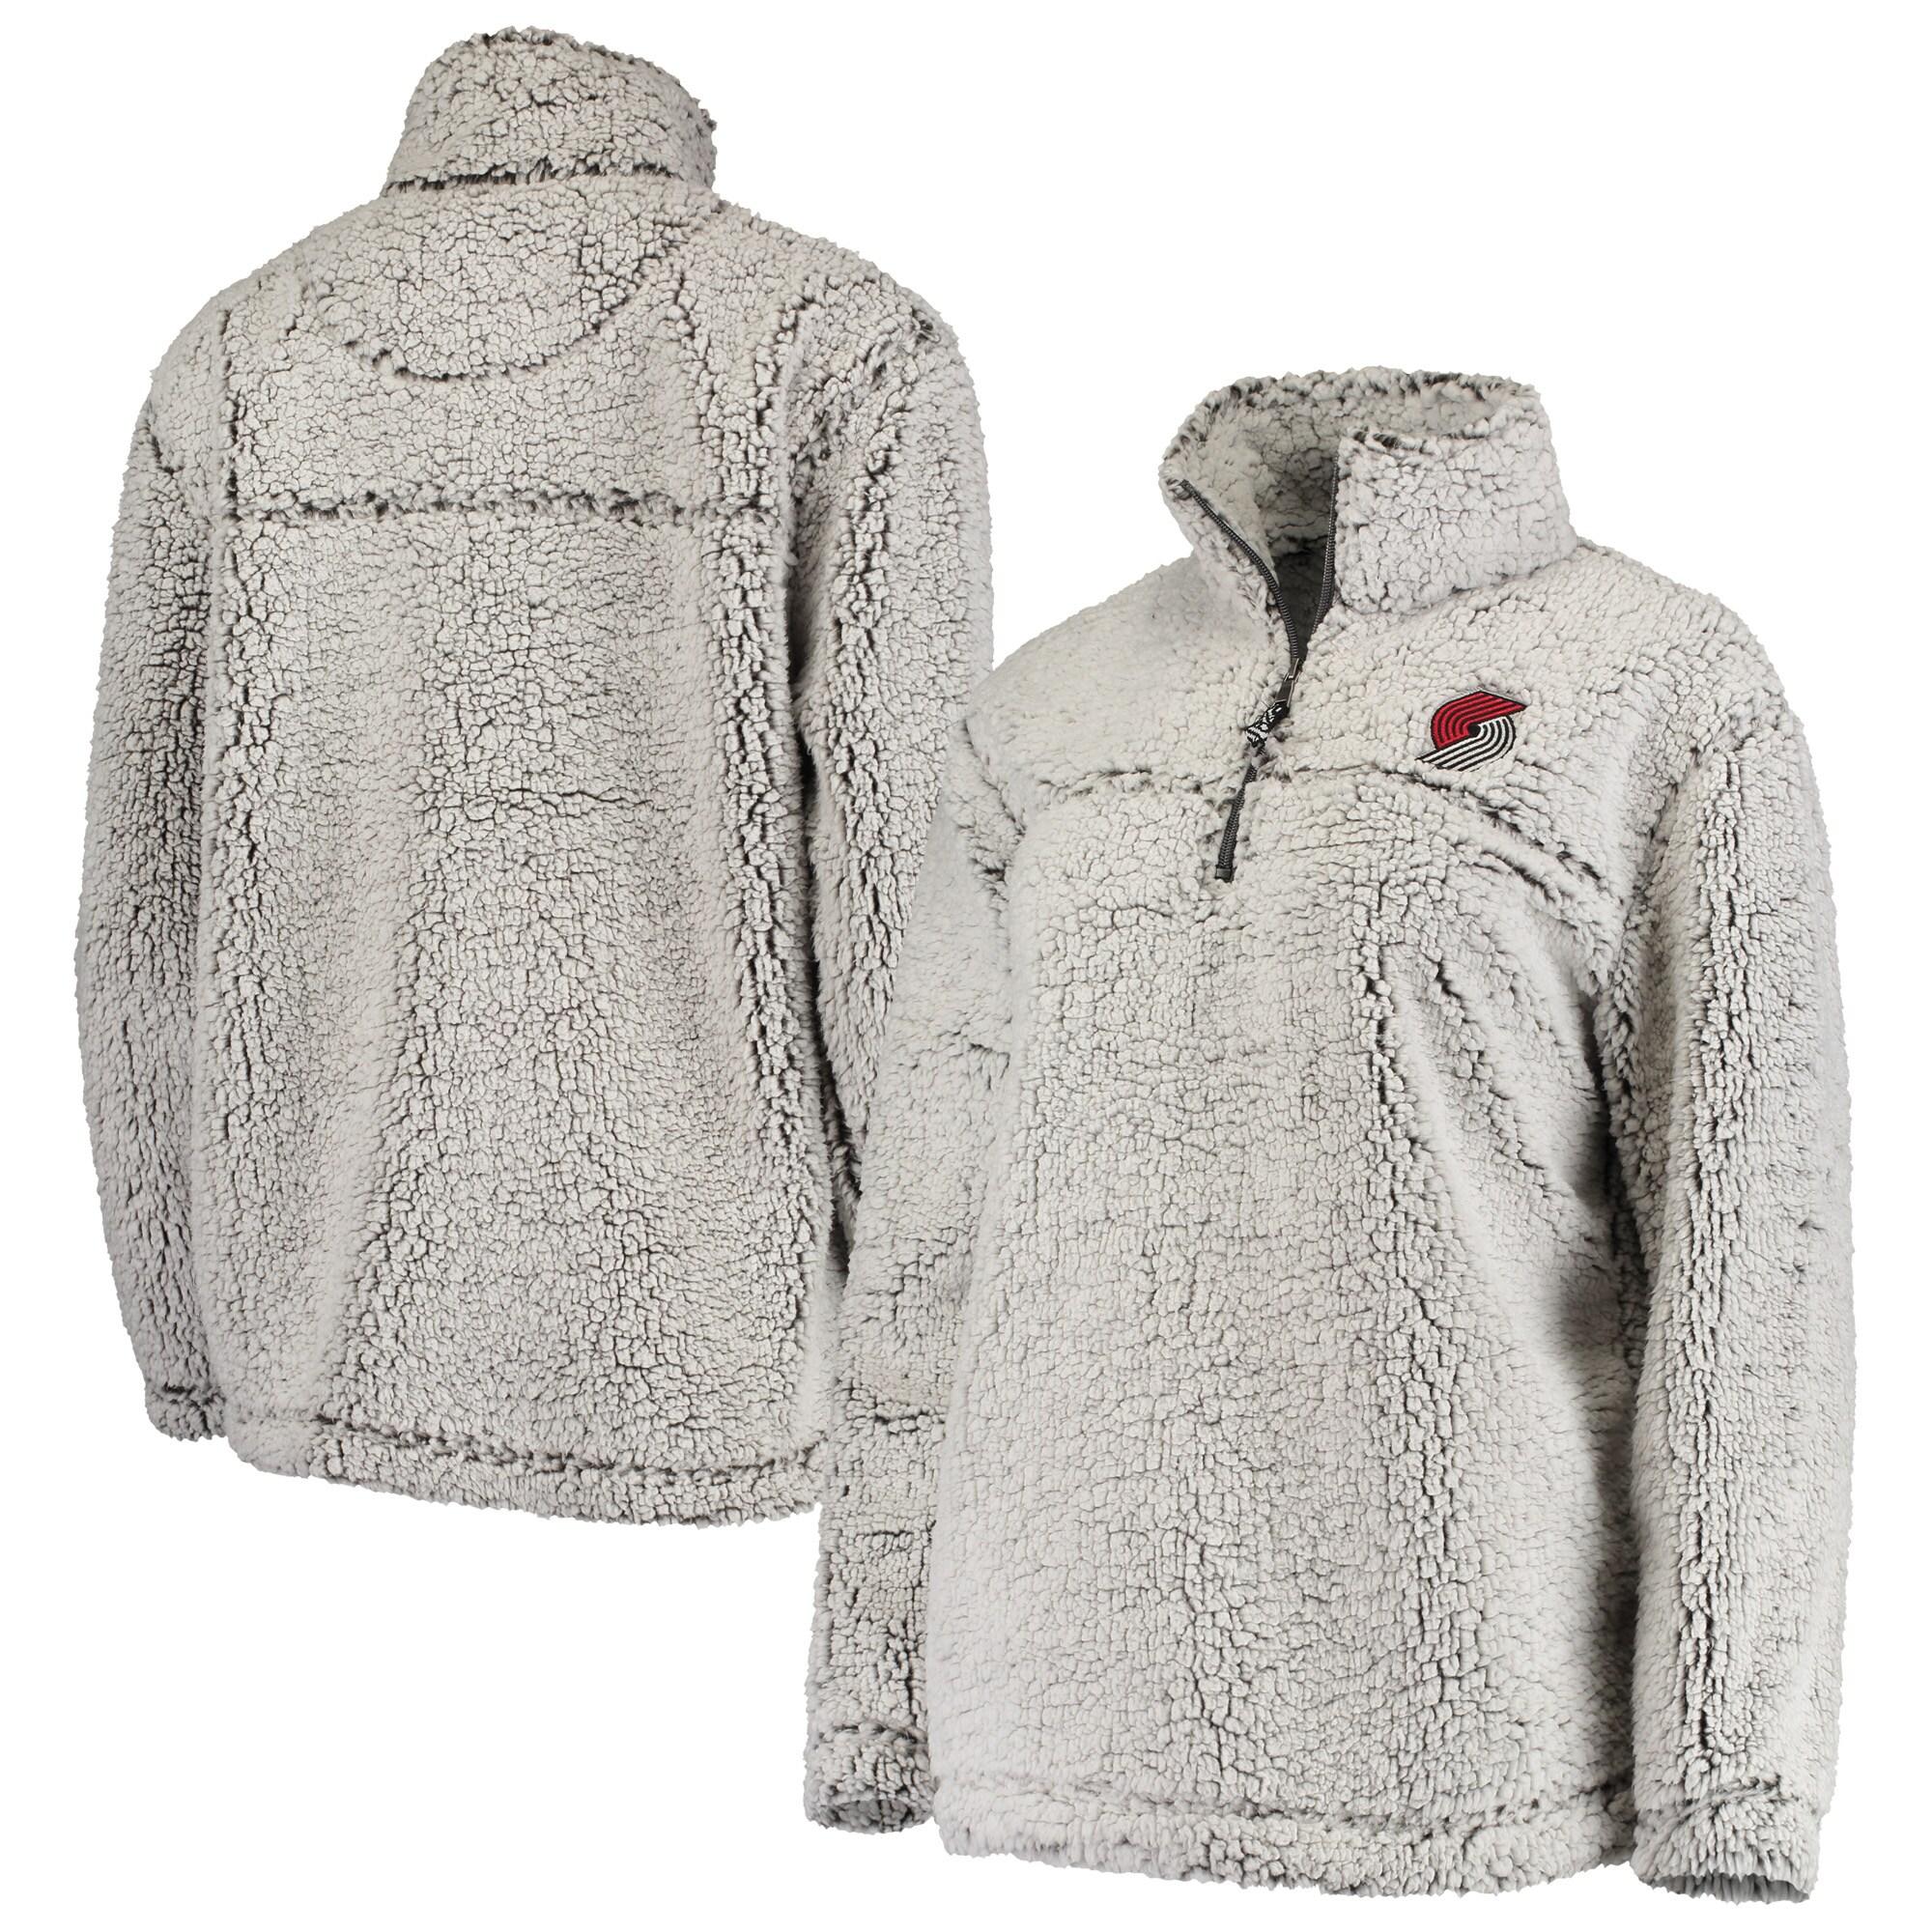 Portland Trail Blazers G-III Sports by Carl Banks Women's Sherpa Quarter-Zip Pullover Jacket - Gray